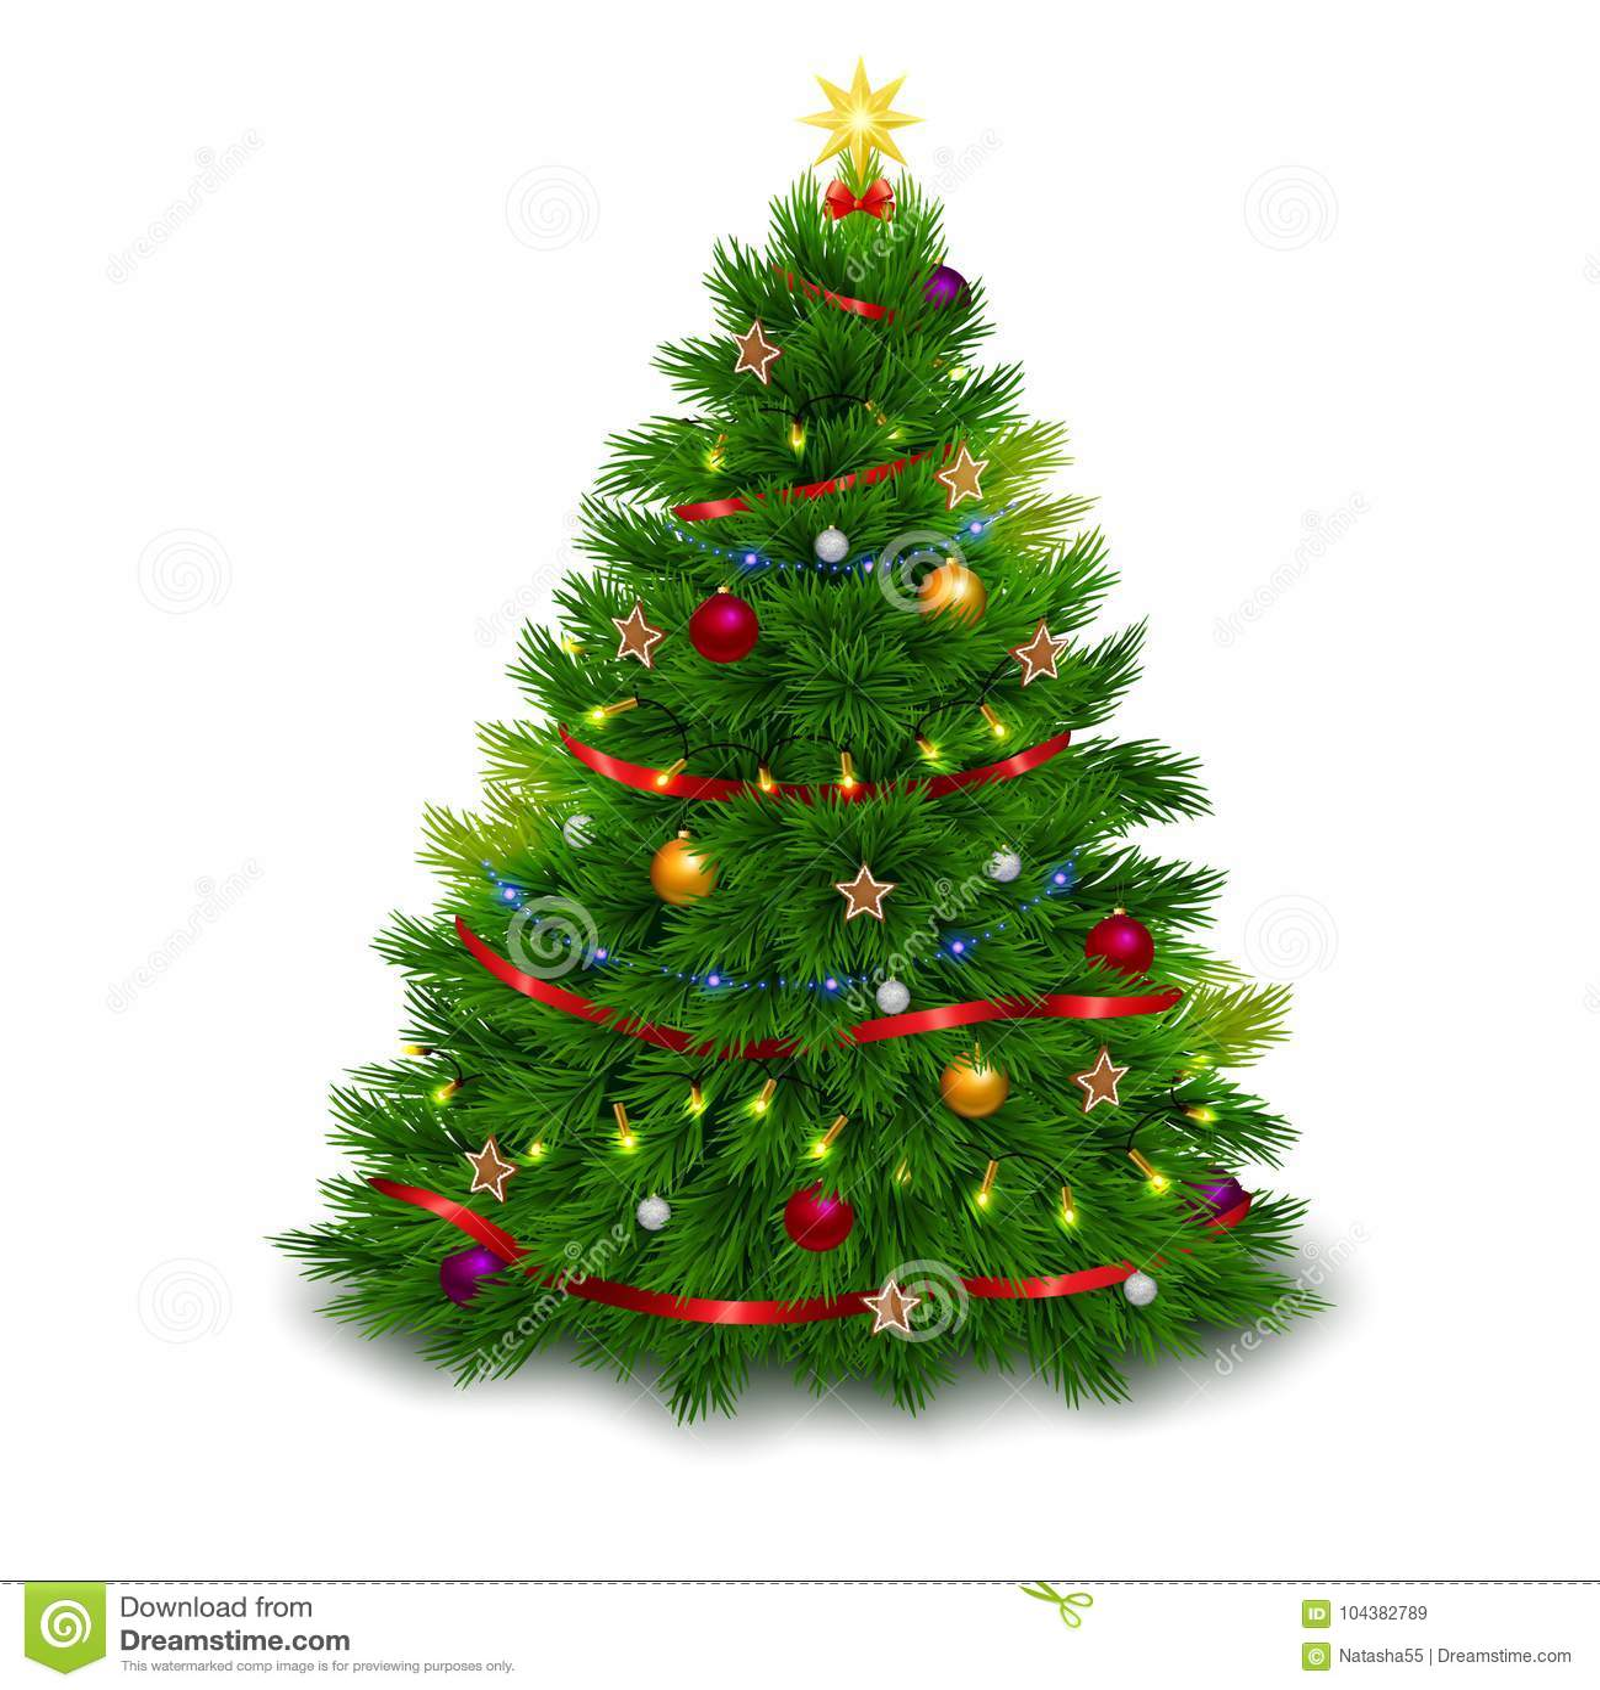 Christmas Tree White Background.Bushy Decorated Christmas Tree On White Background Stock